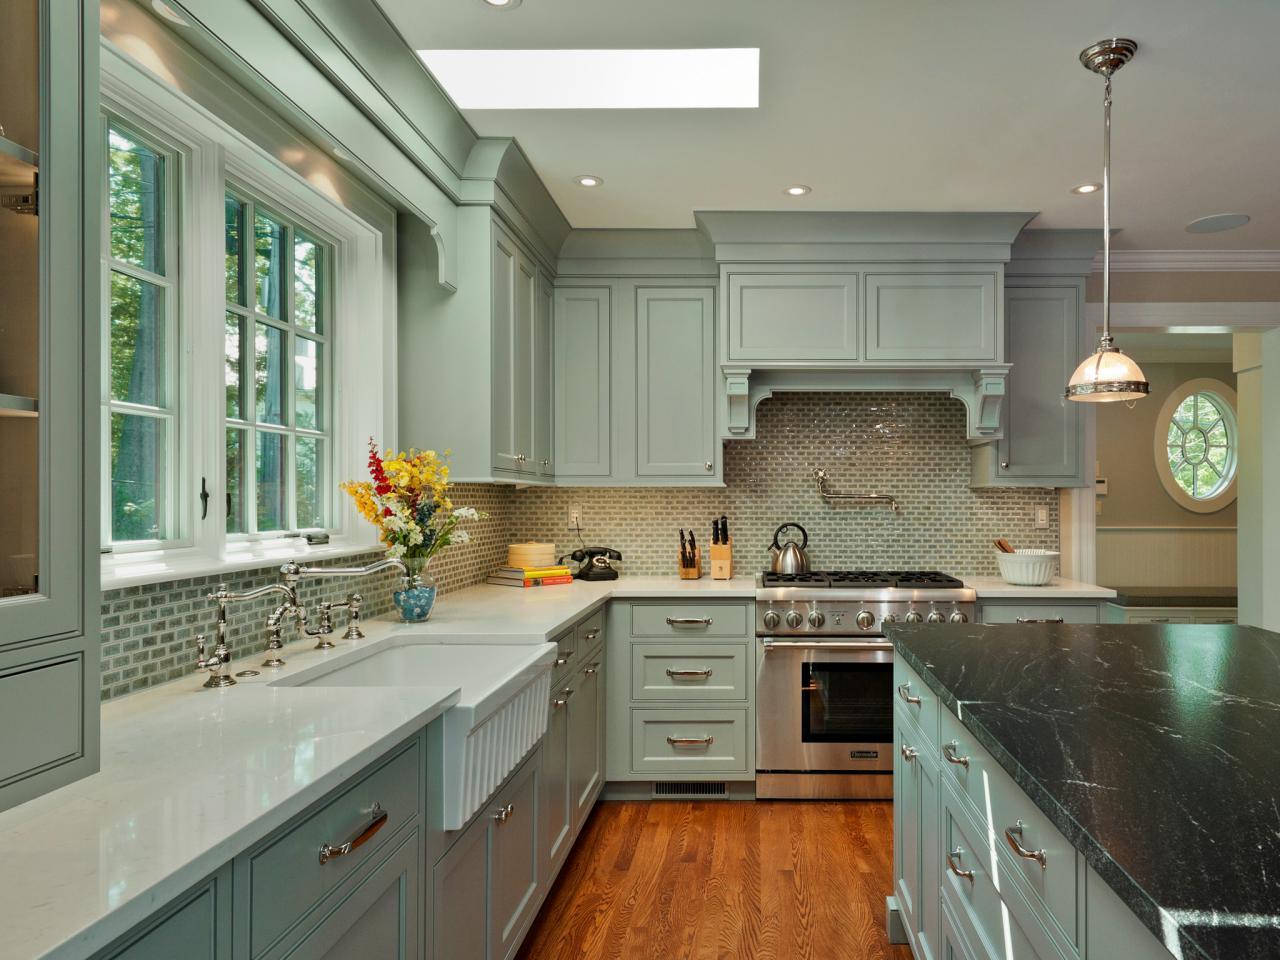 Кухня 14 кв. м зеленая